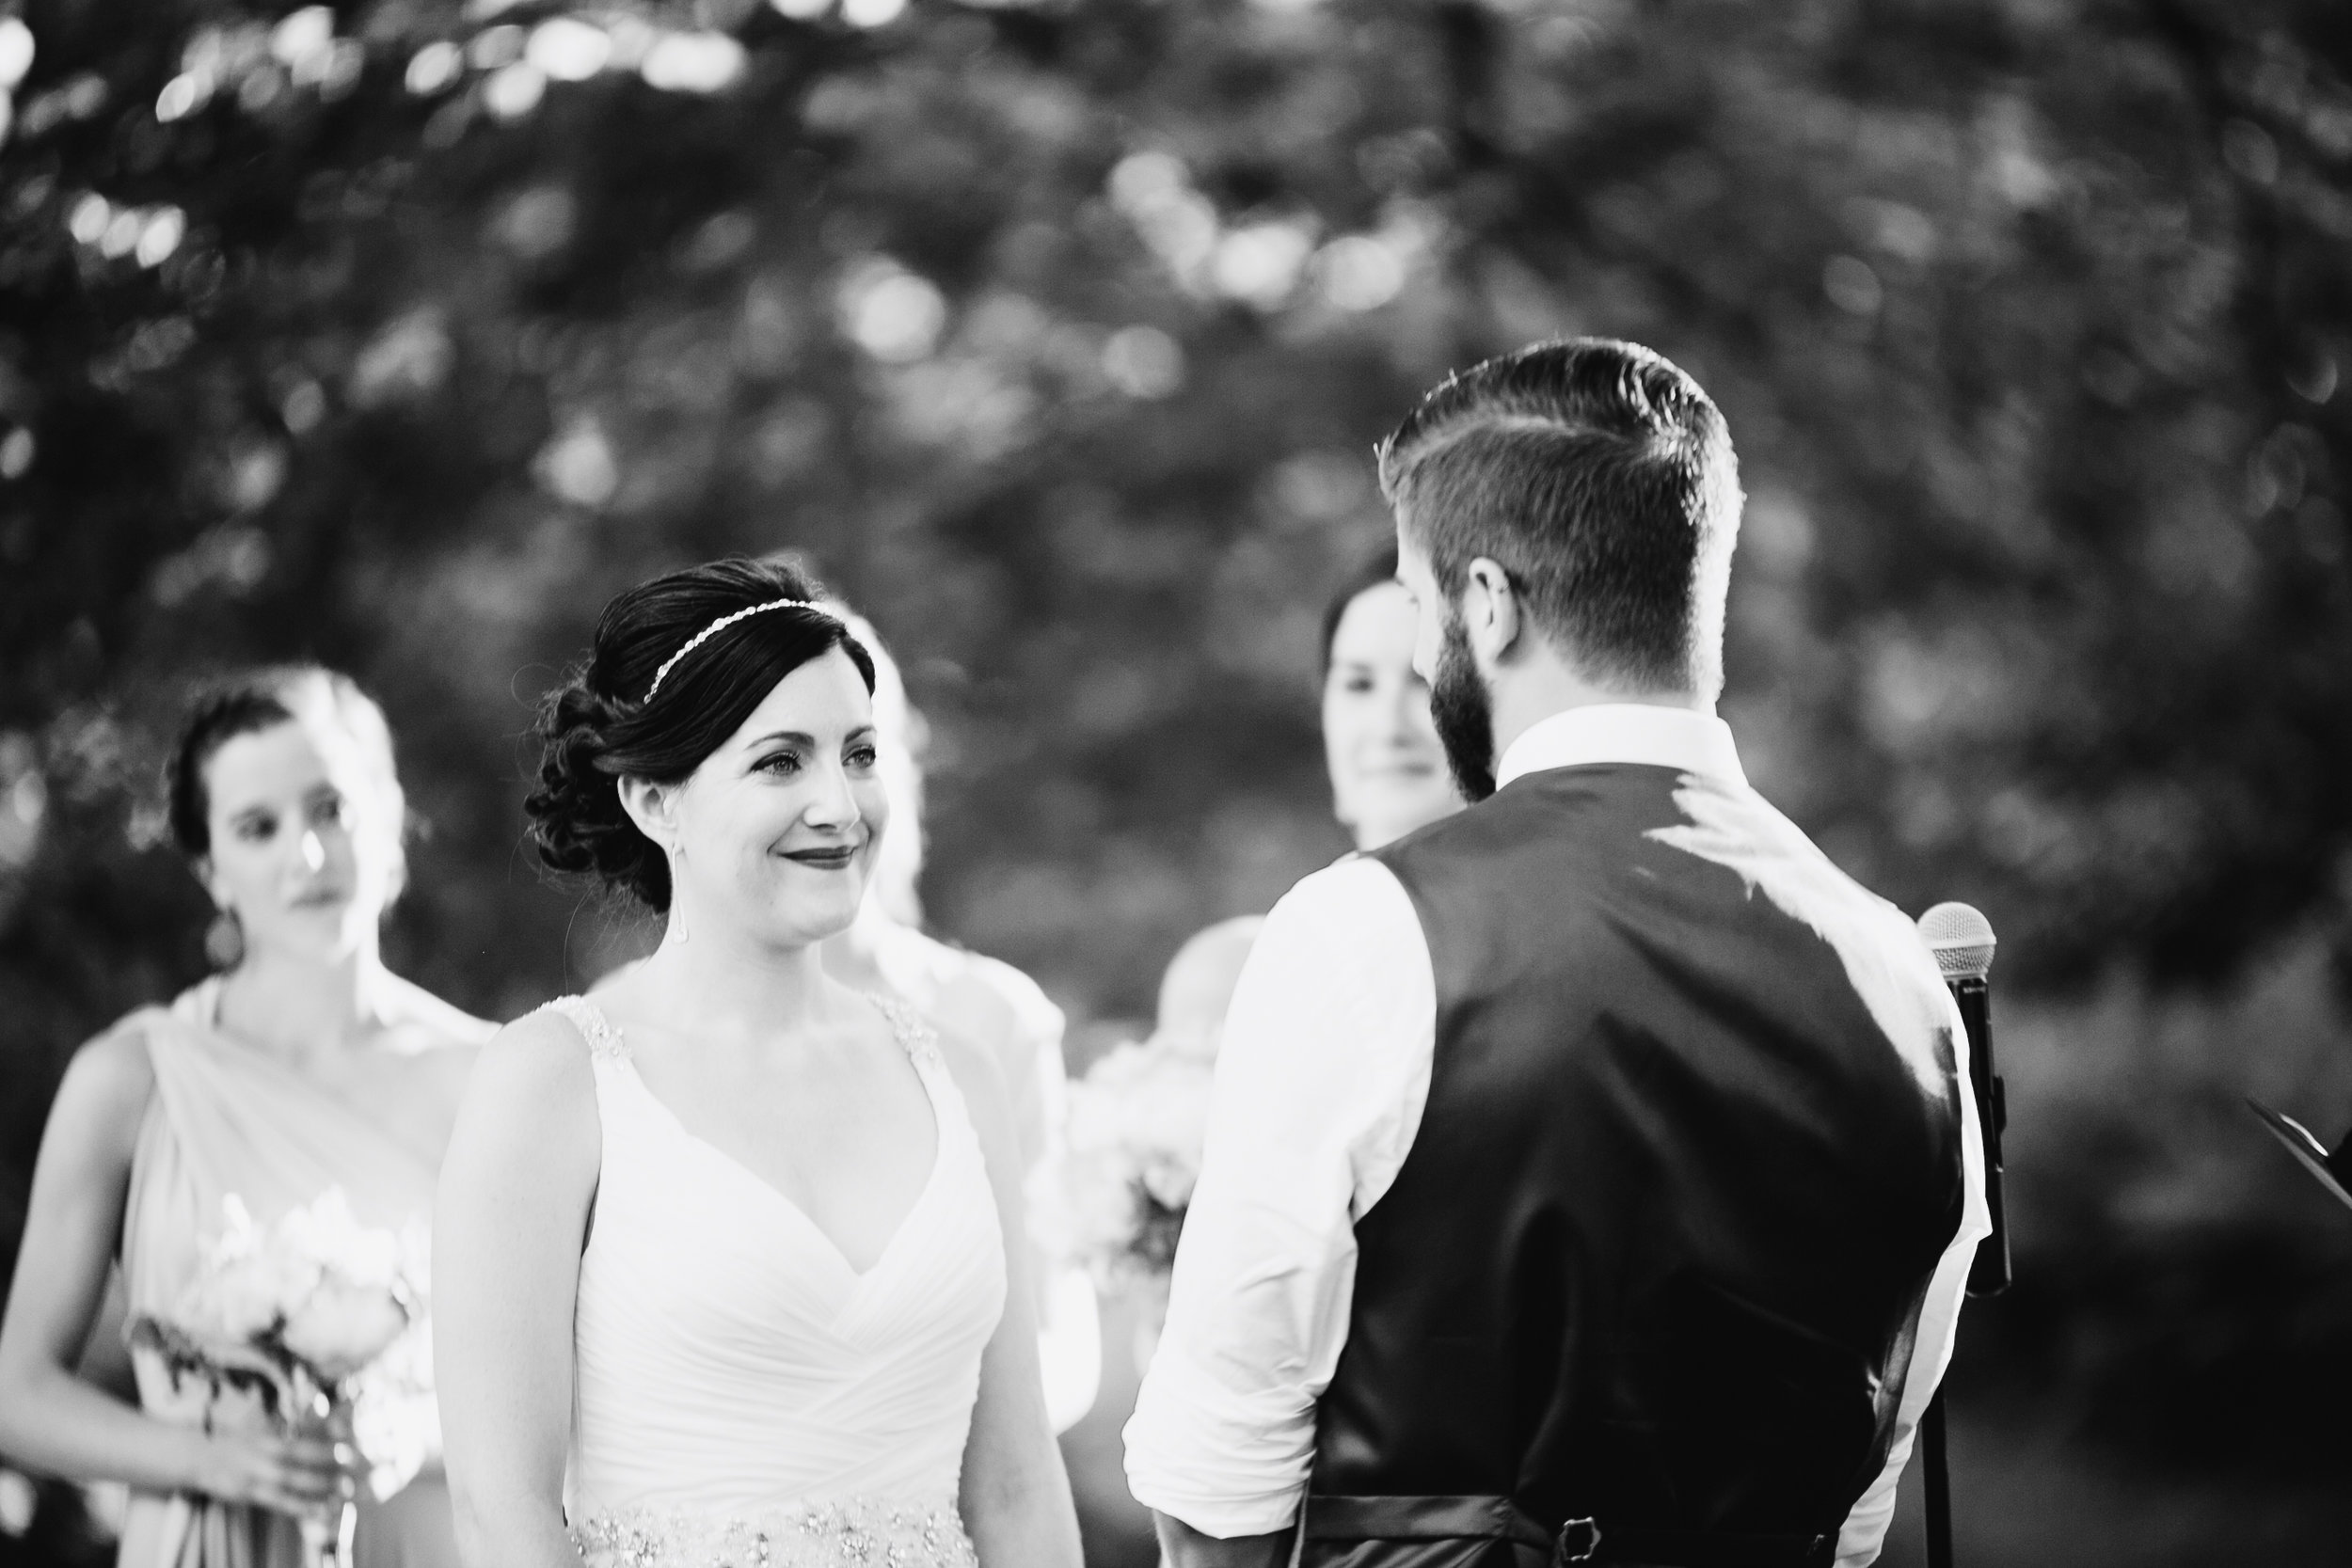 TYLER ARBORETUM WEDDING PHOTOGRAPHY LOVESTRUCK PICTURES-056.jpg